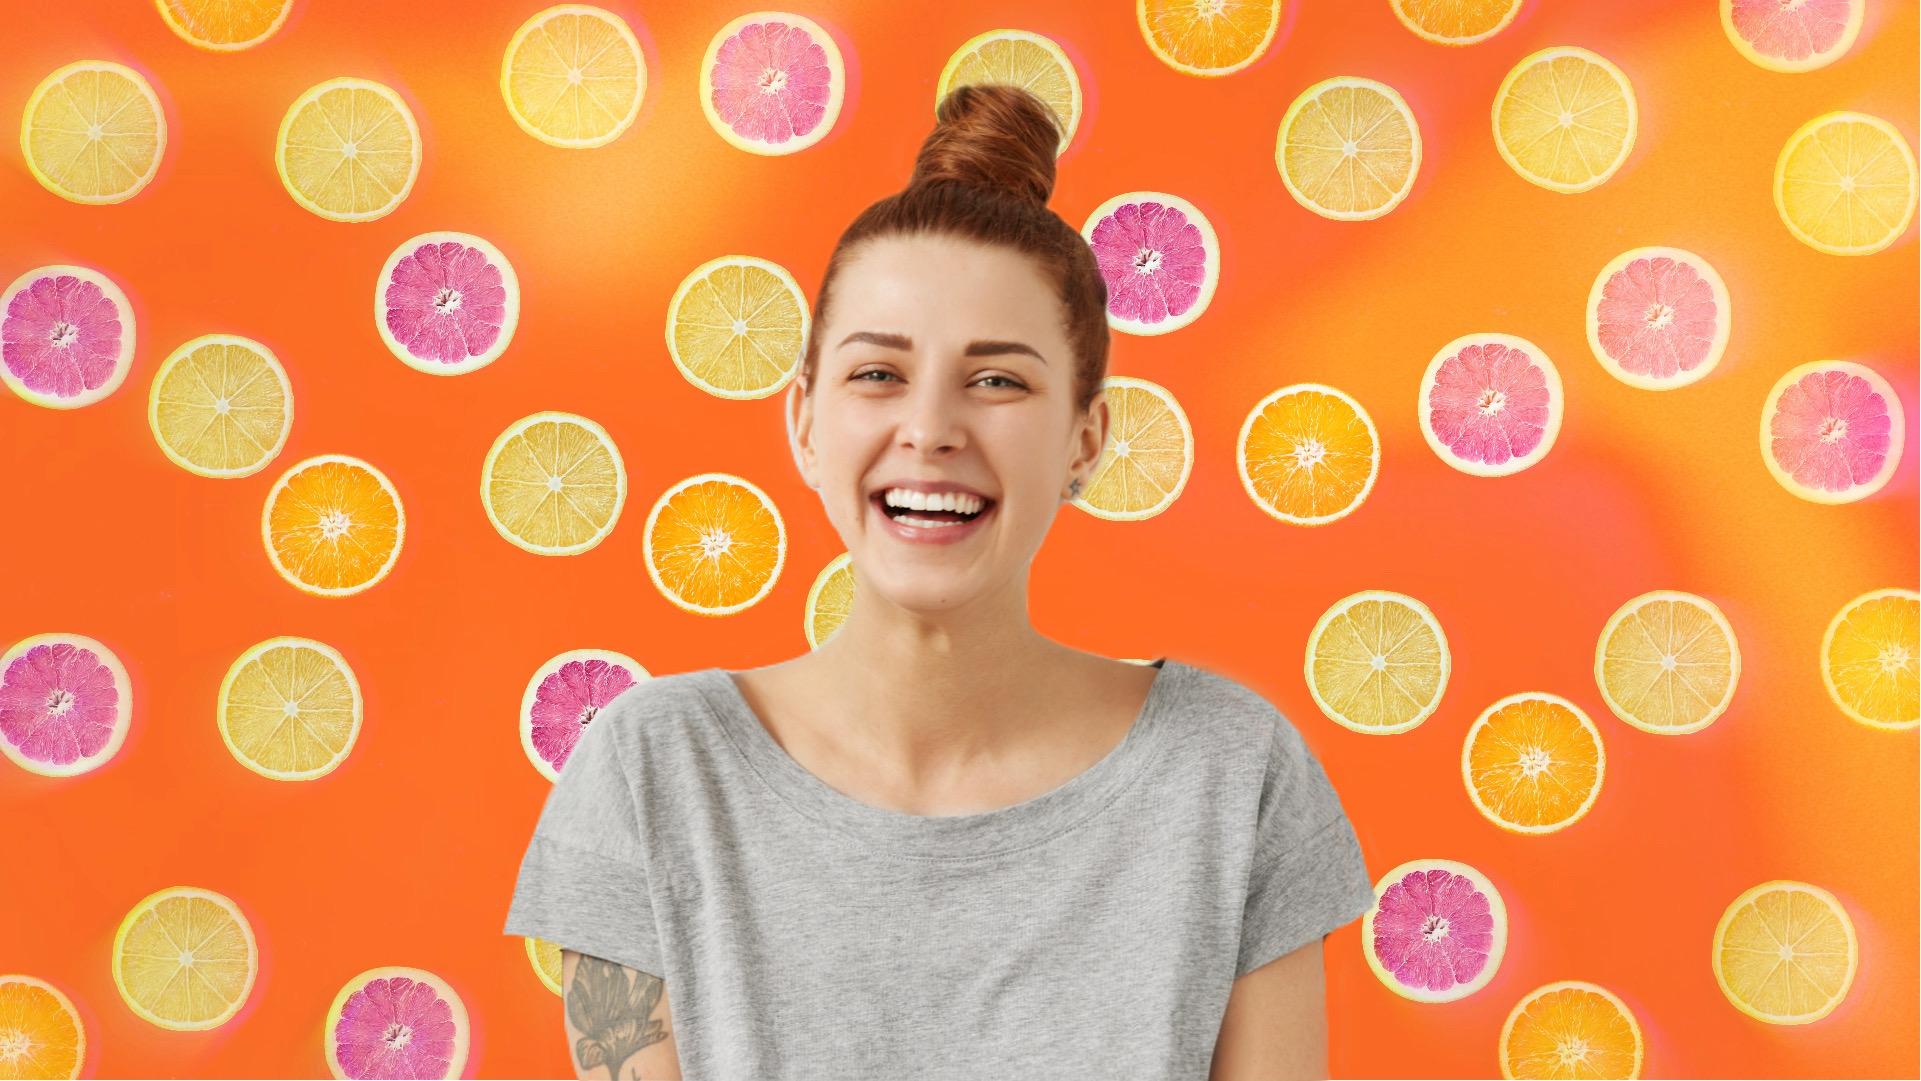 Citrus zoom background